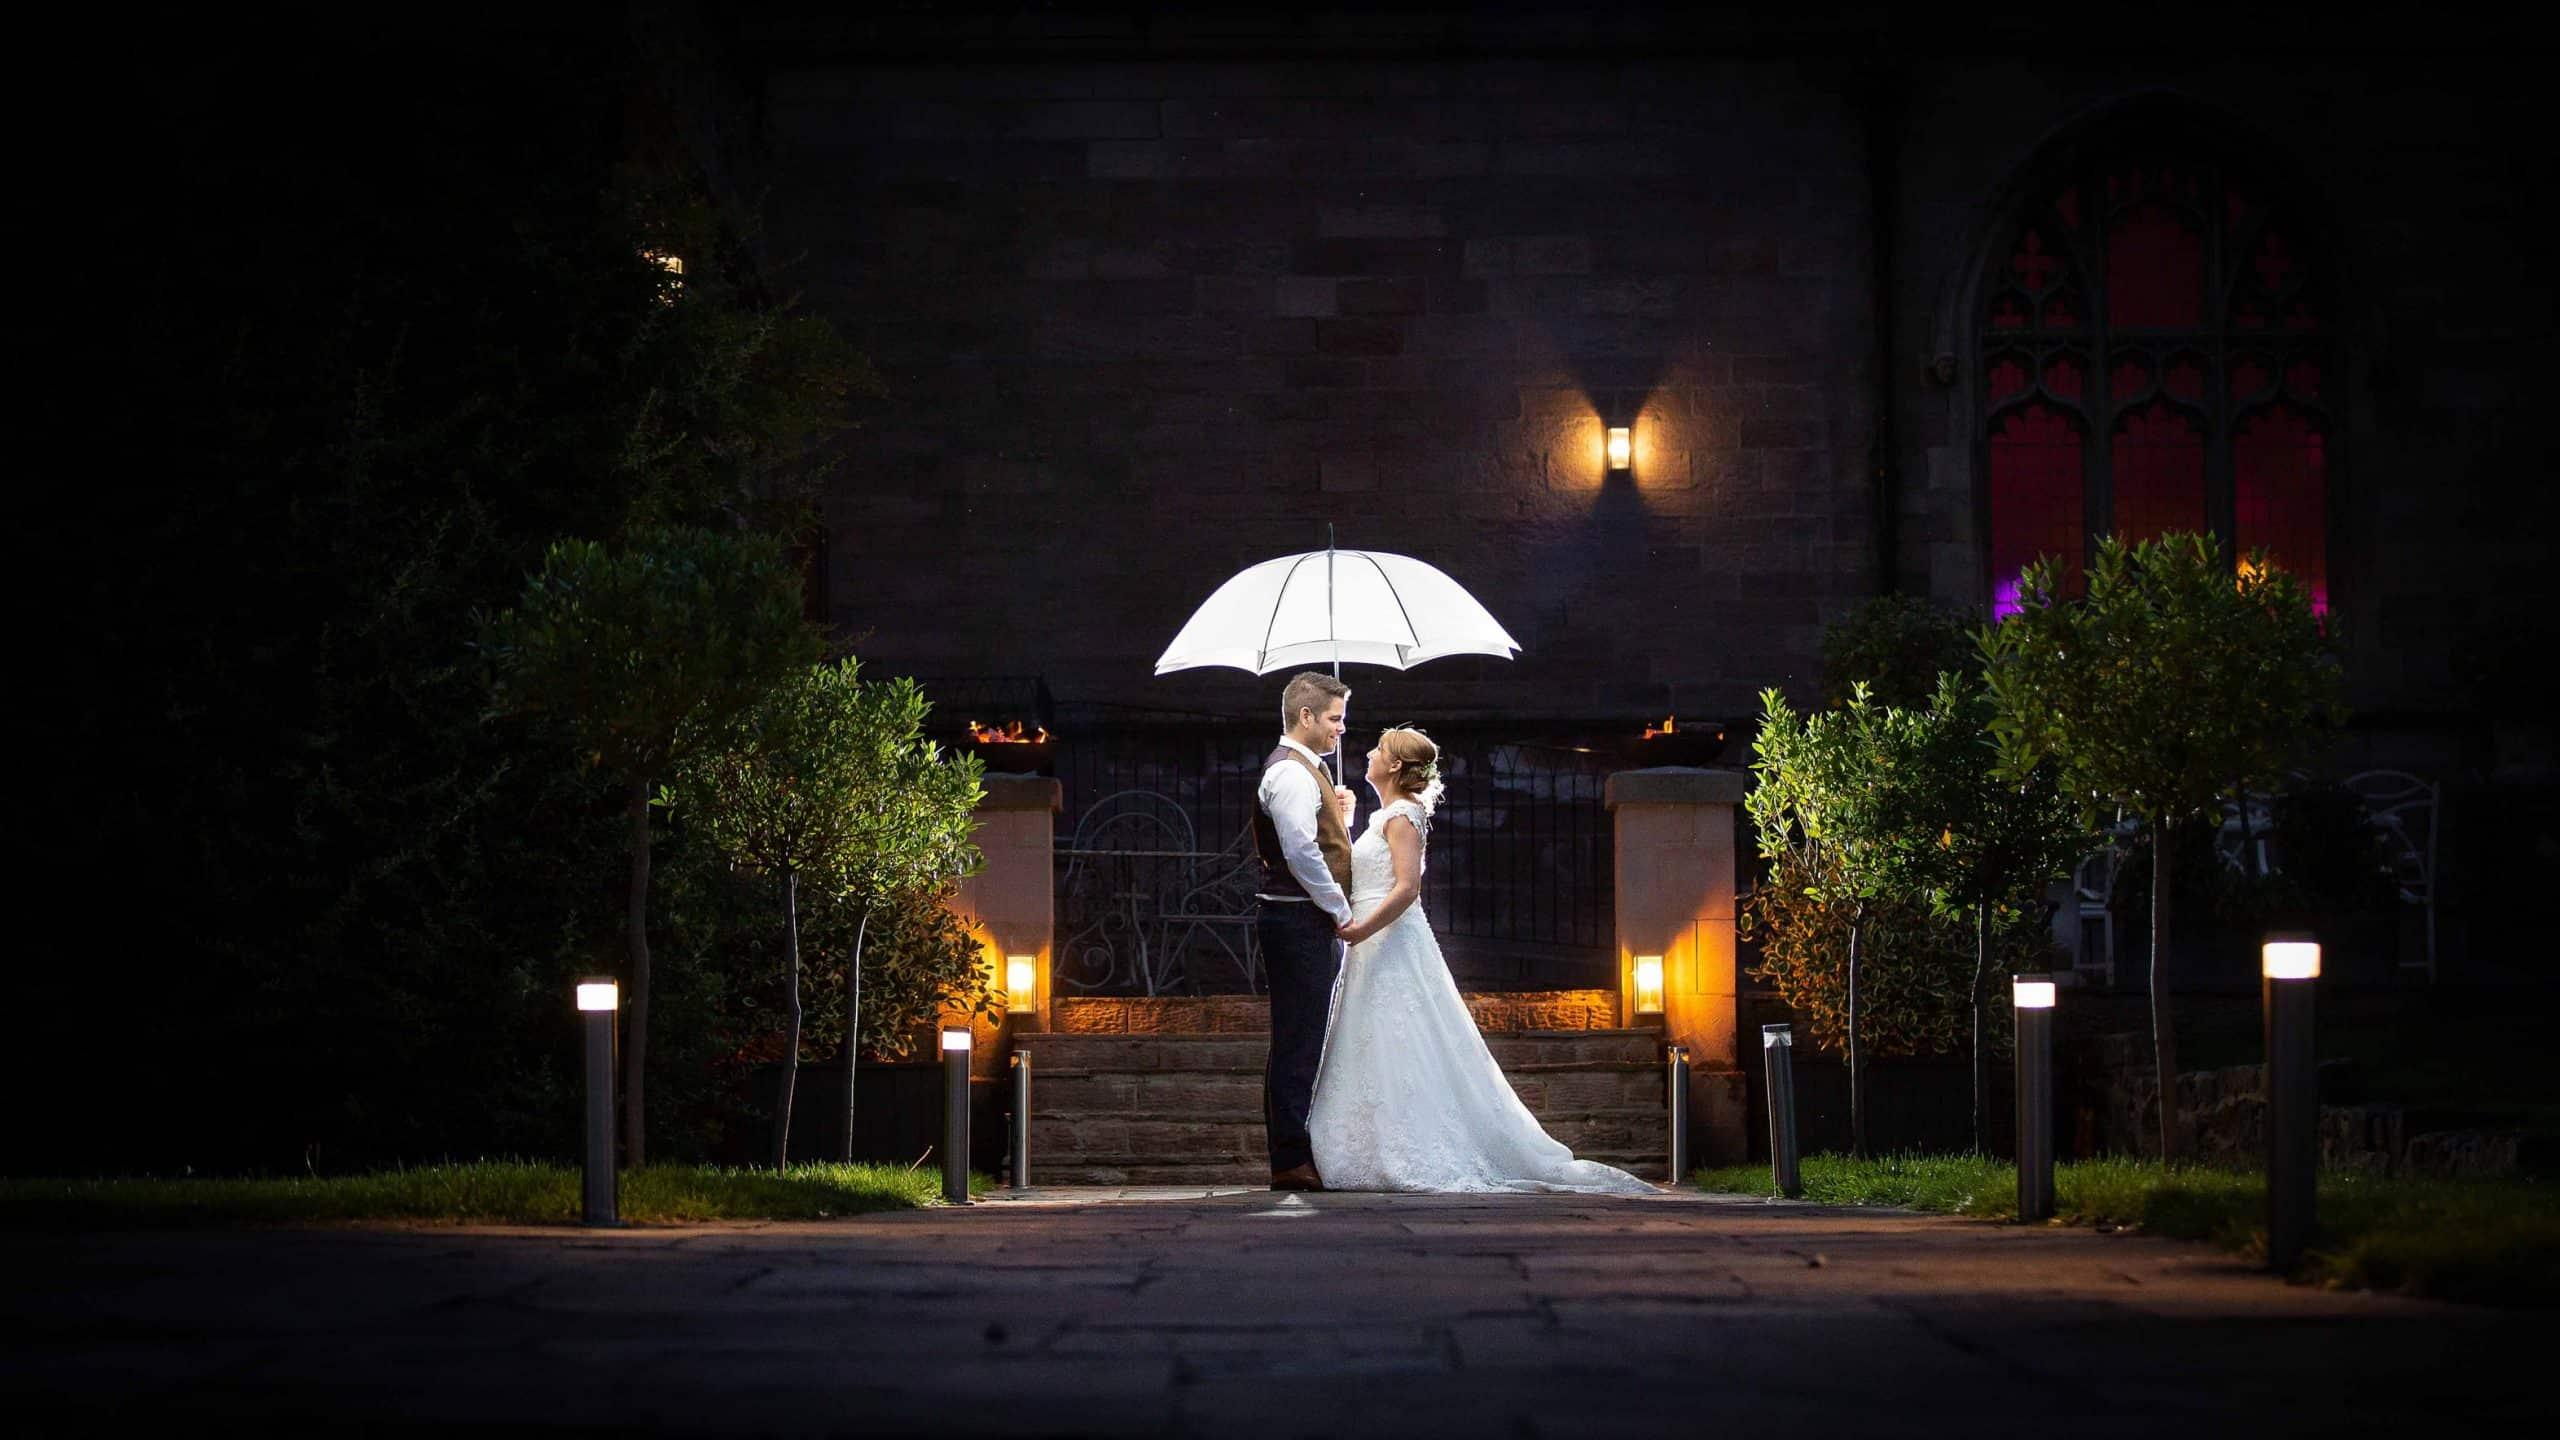 Award winning wedding images at Ellingham Hall